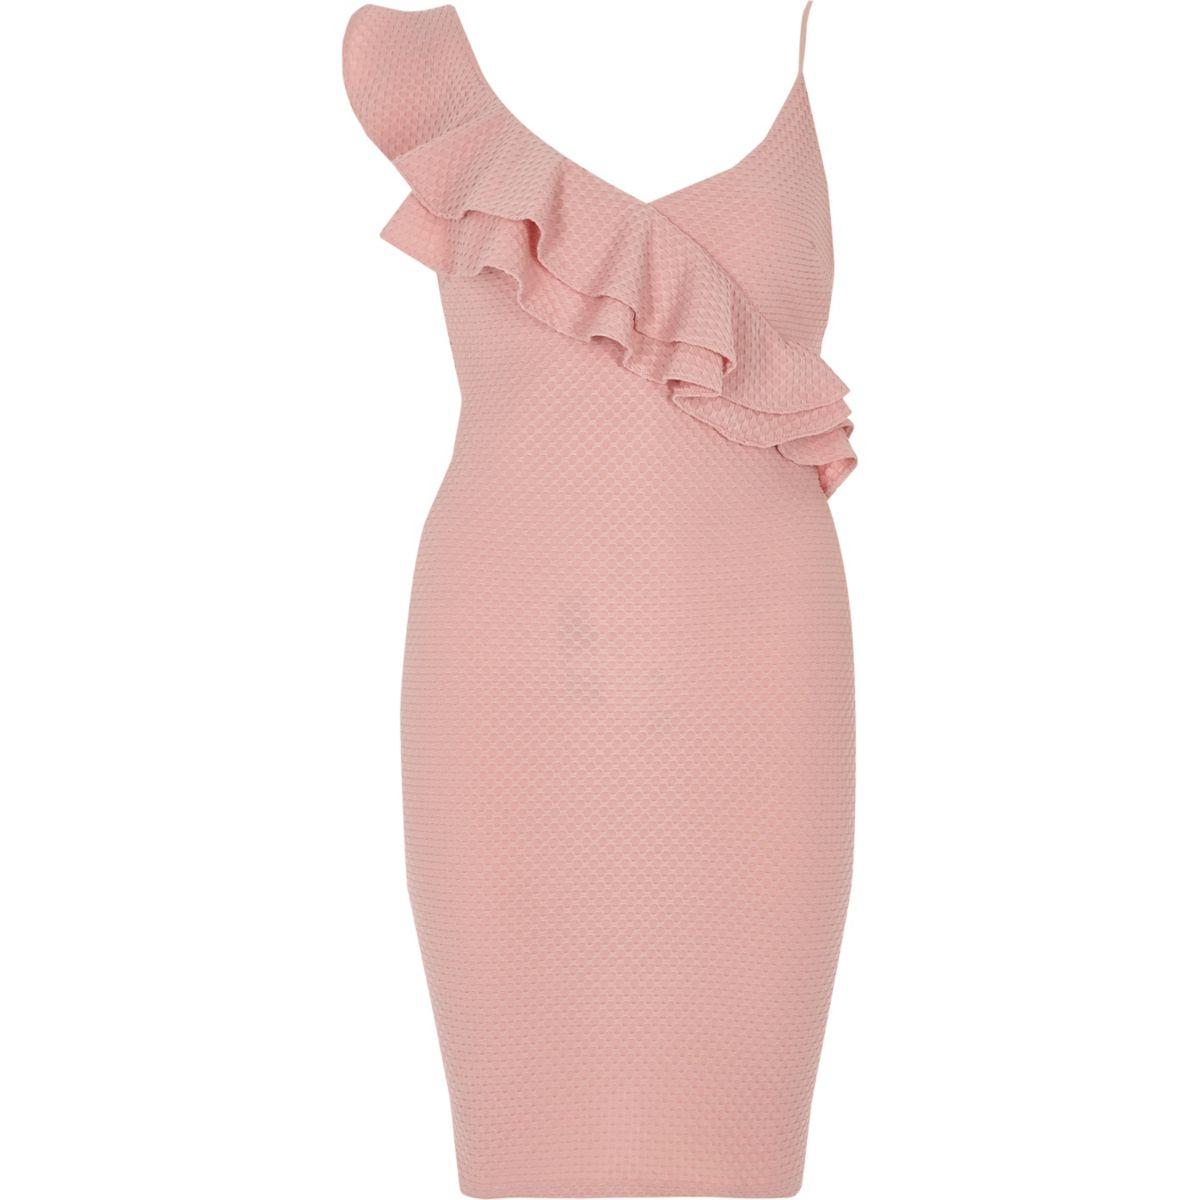 Pink asymmetric frill bodycon dress